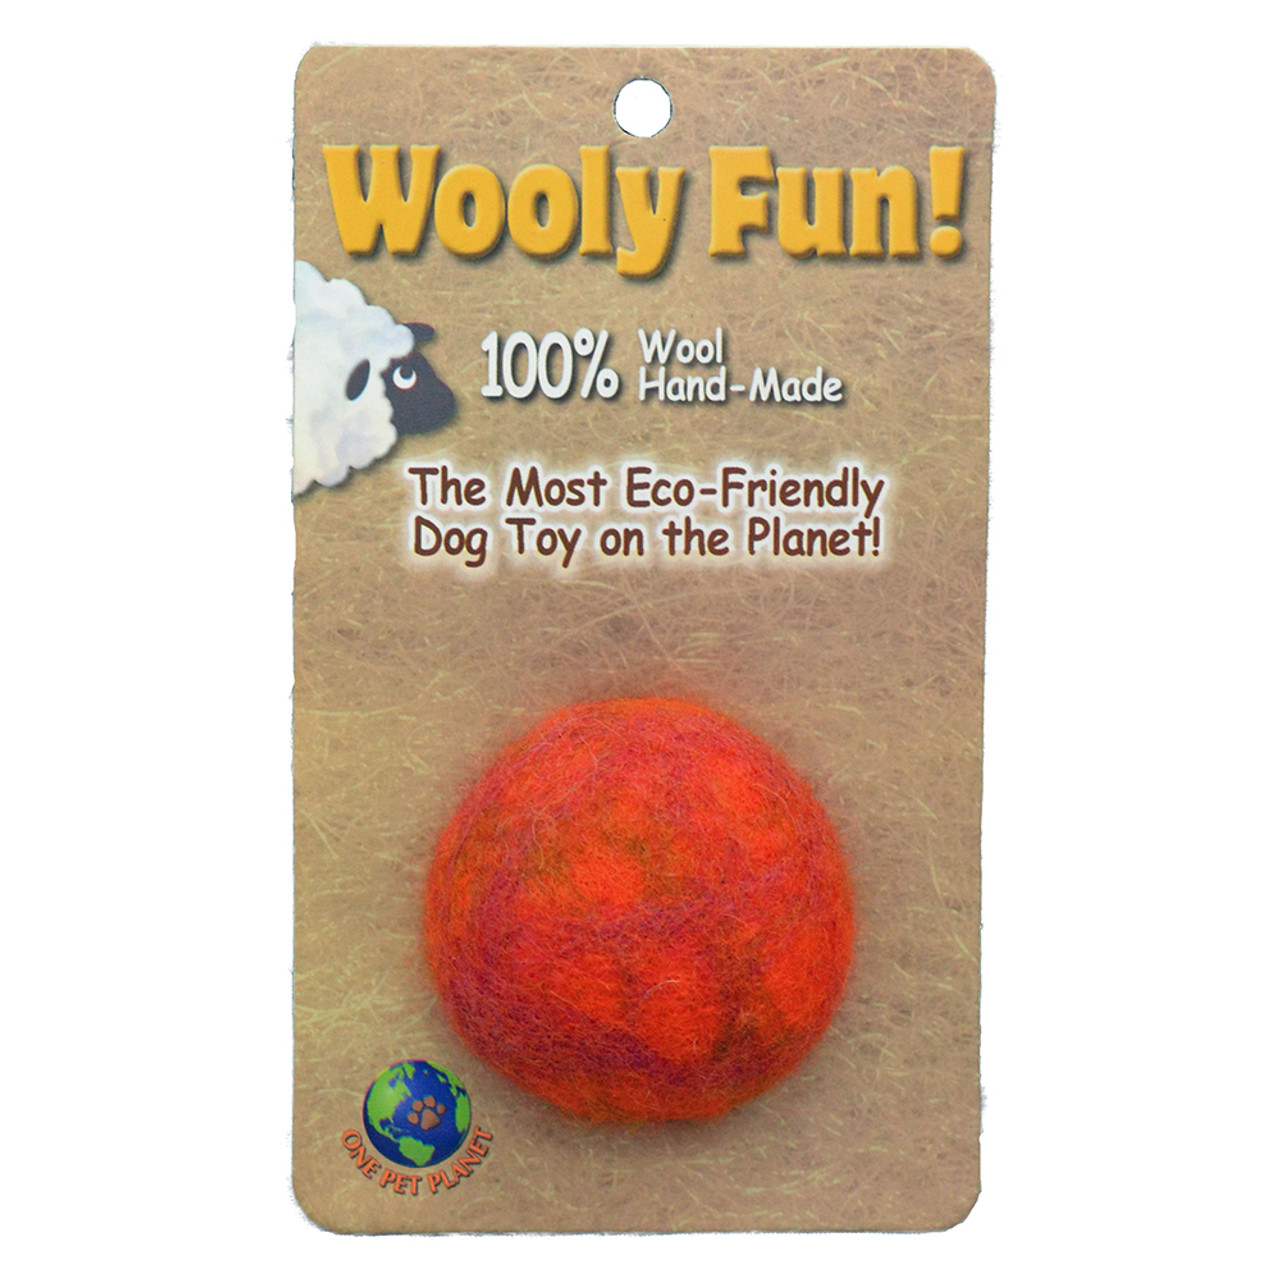 Wooly Fun! Ball Dog Toy